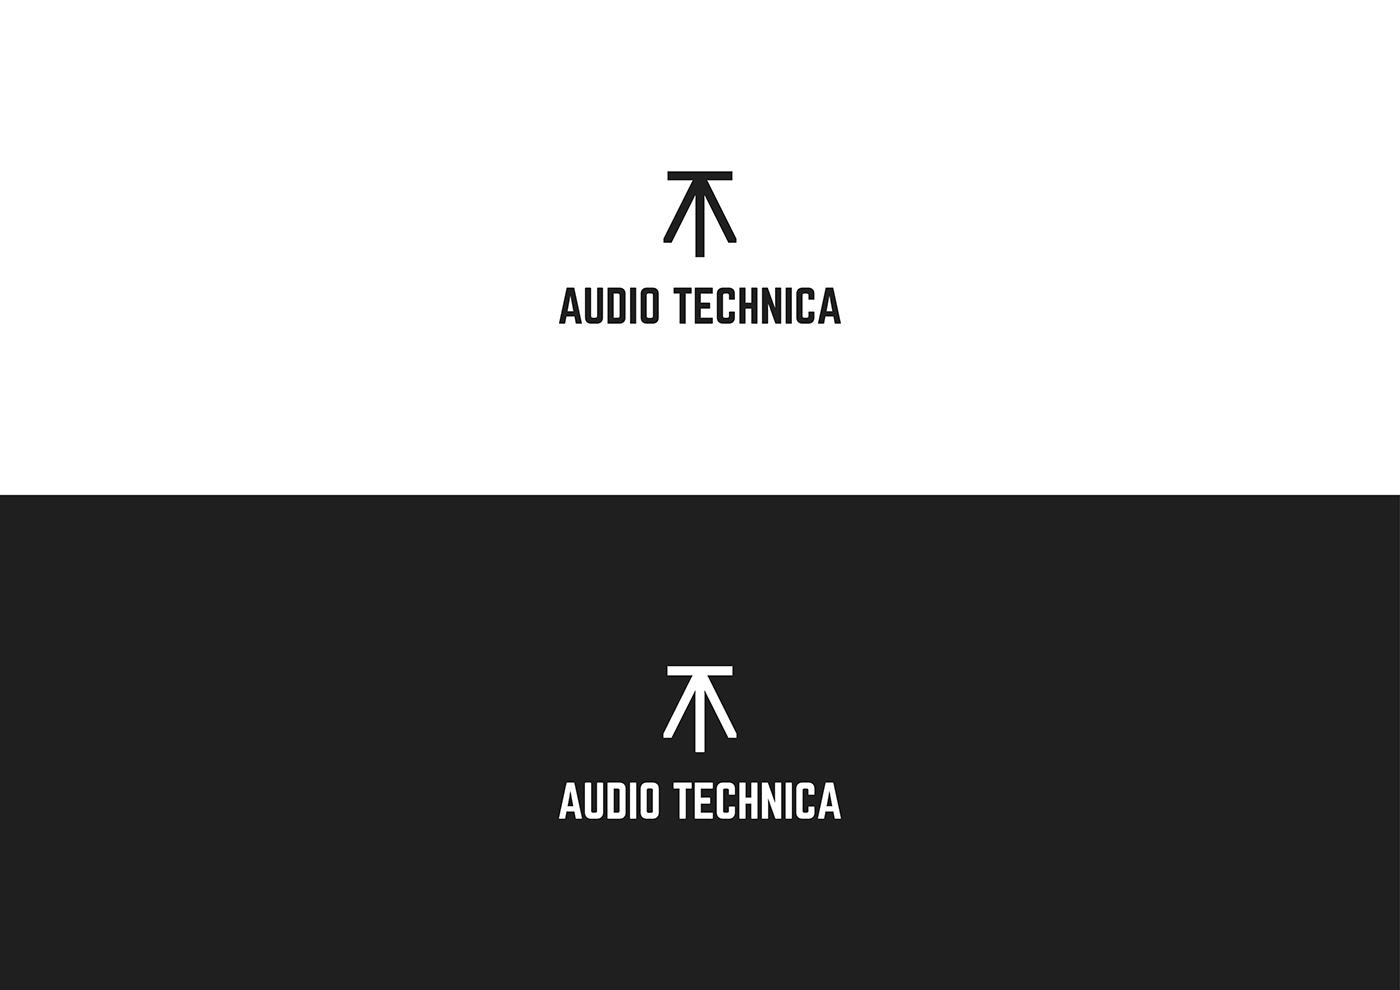 design bridge competition audio technica rebrand on behance